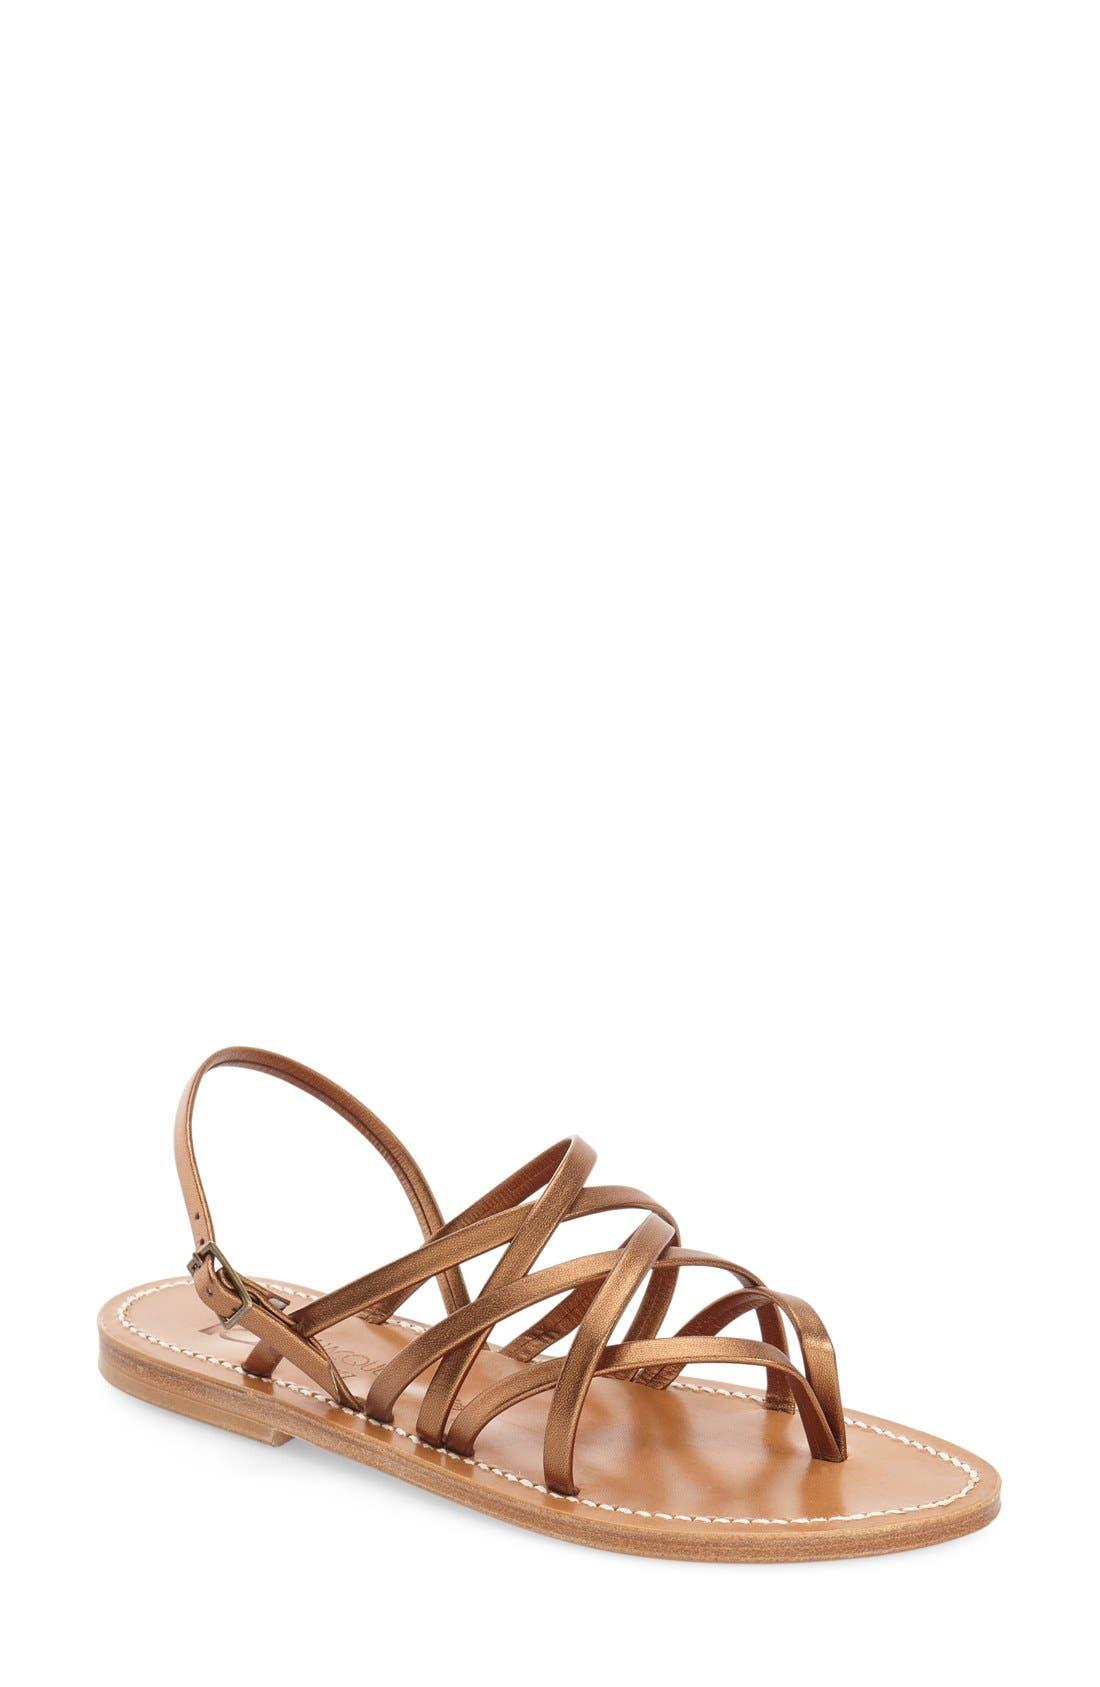 Alternate Image 1 Selected - K.Jacques St. Tropez Strappy Flat Sandal (Women)